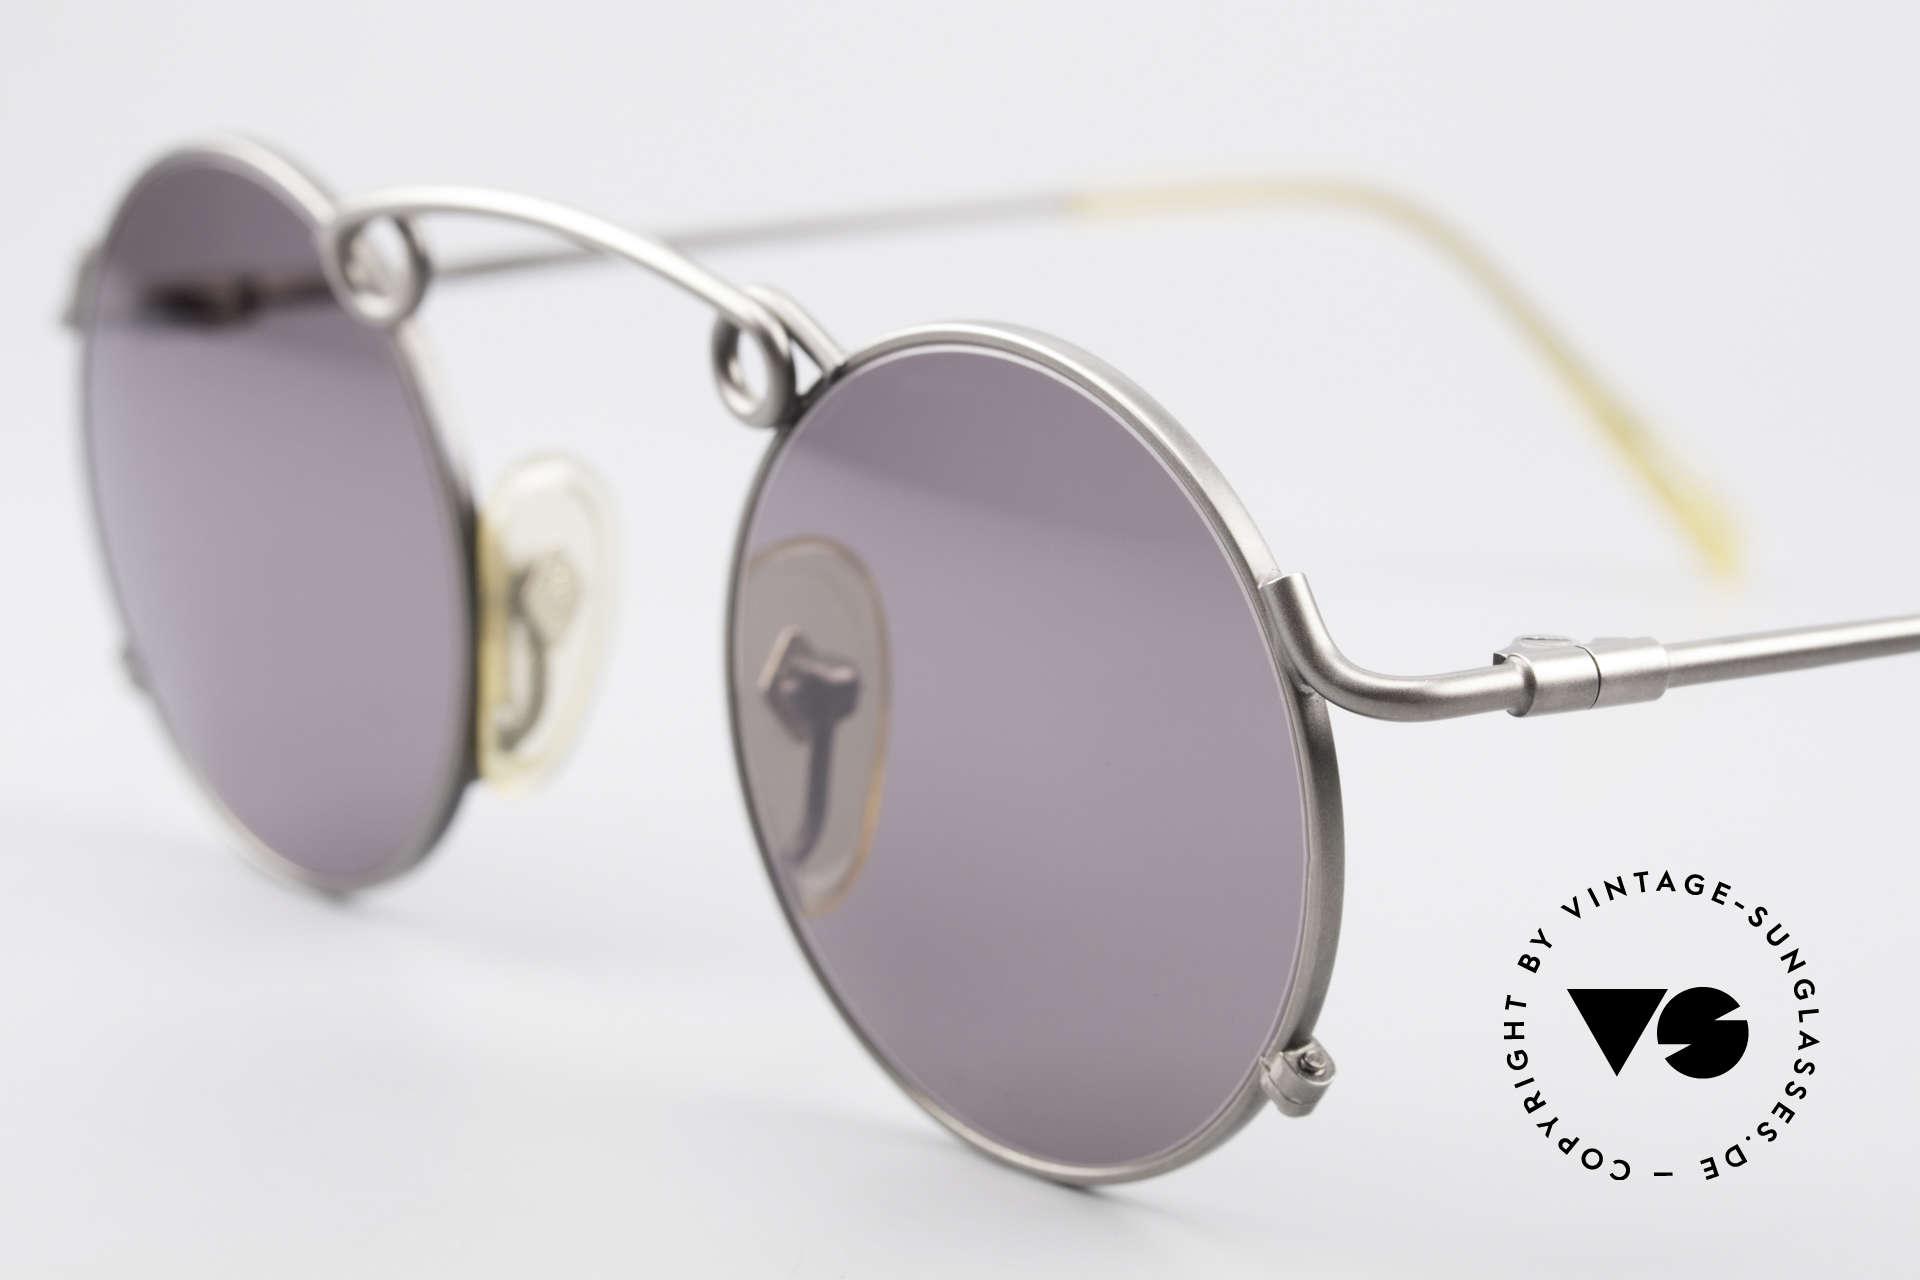 Sunglasses Jean Paul Gaultier 56 1178 Artful Round Panto